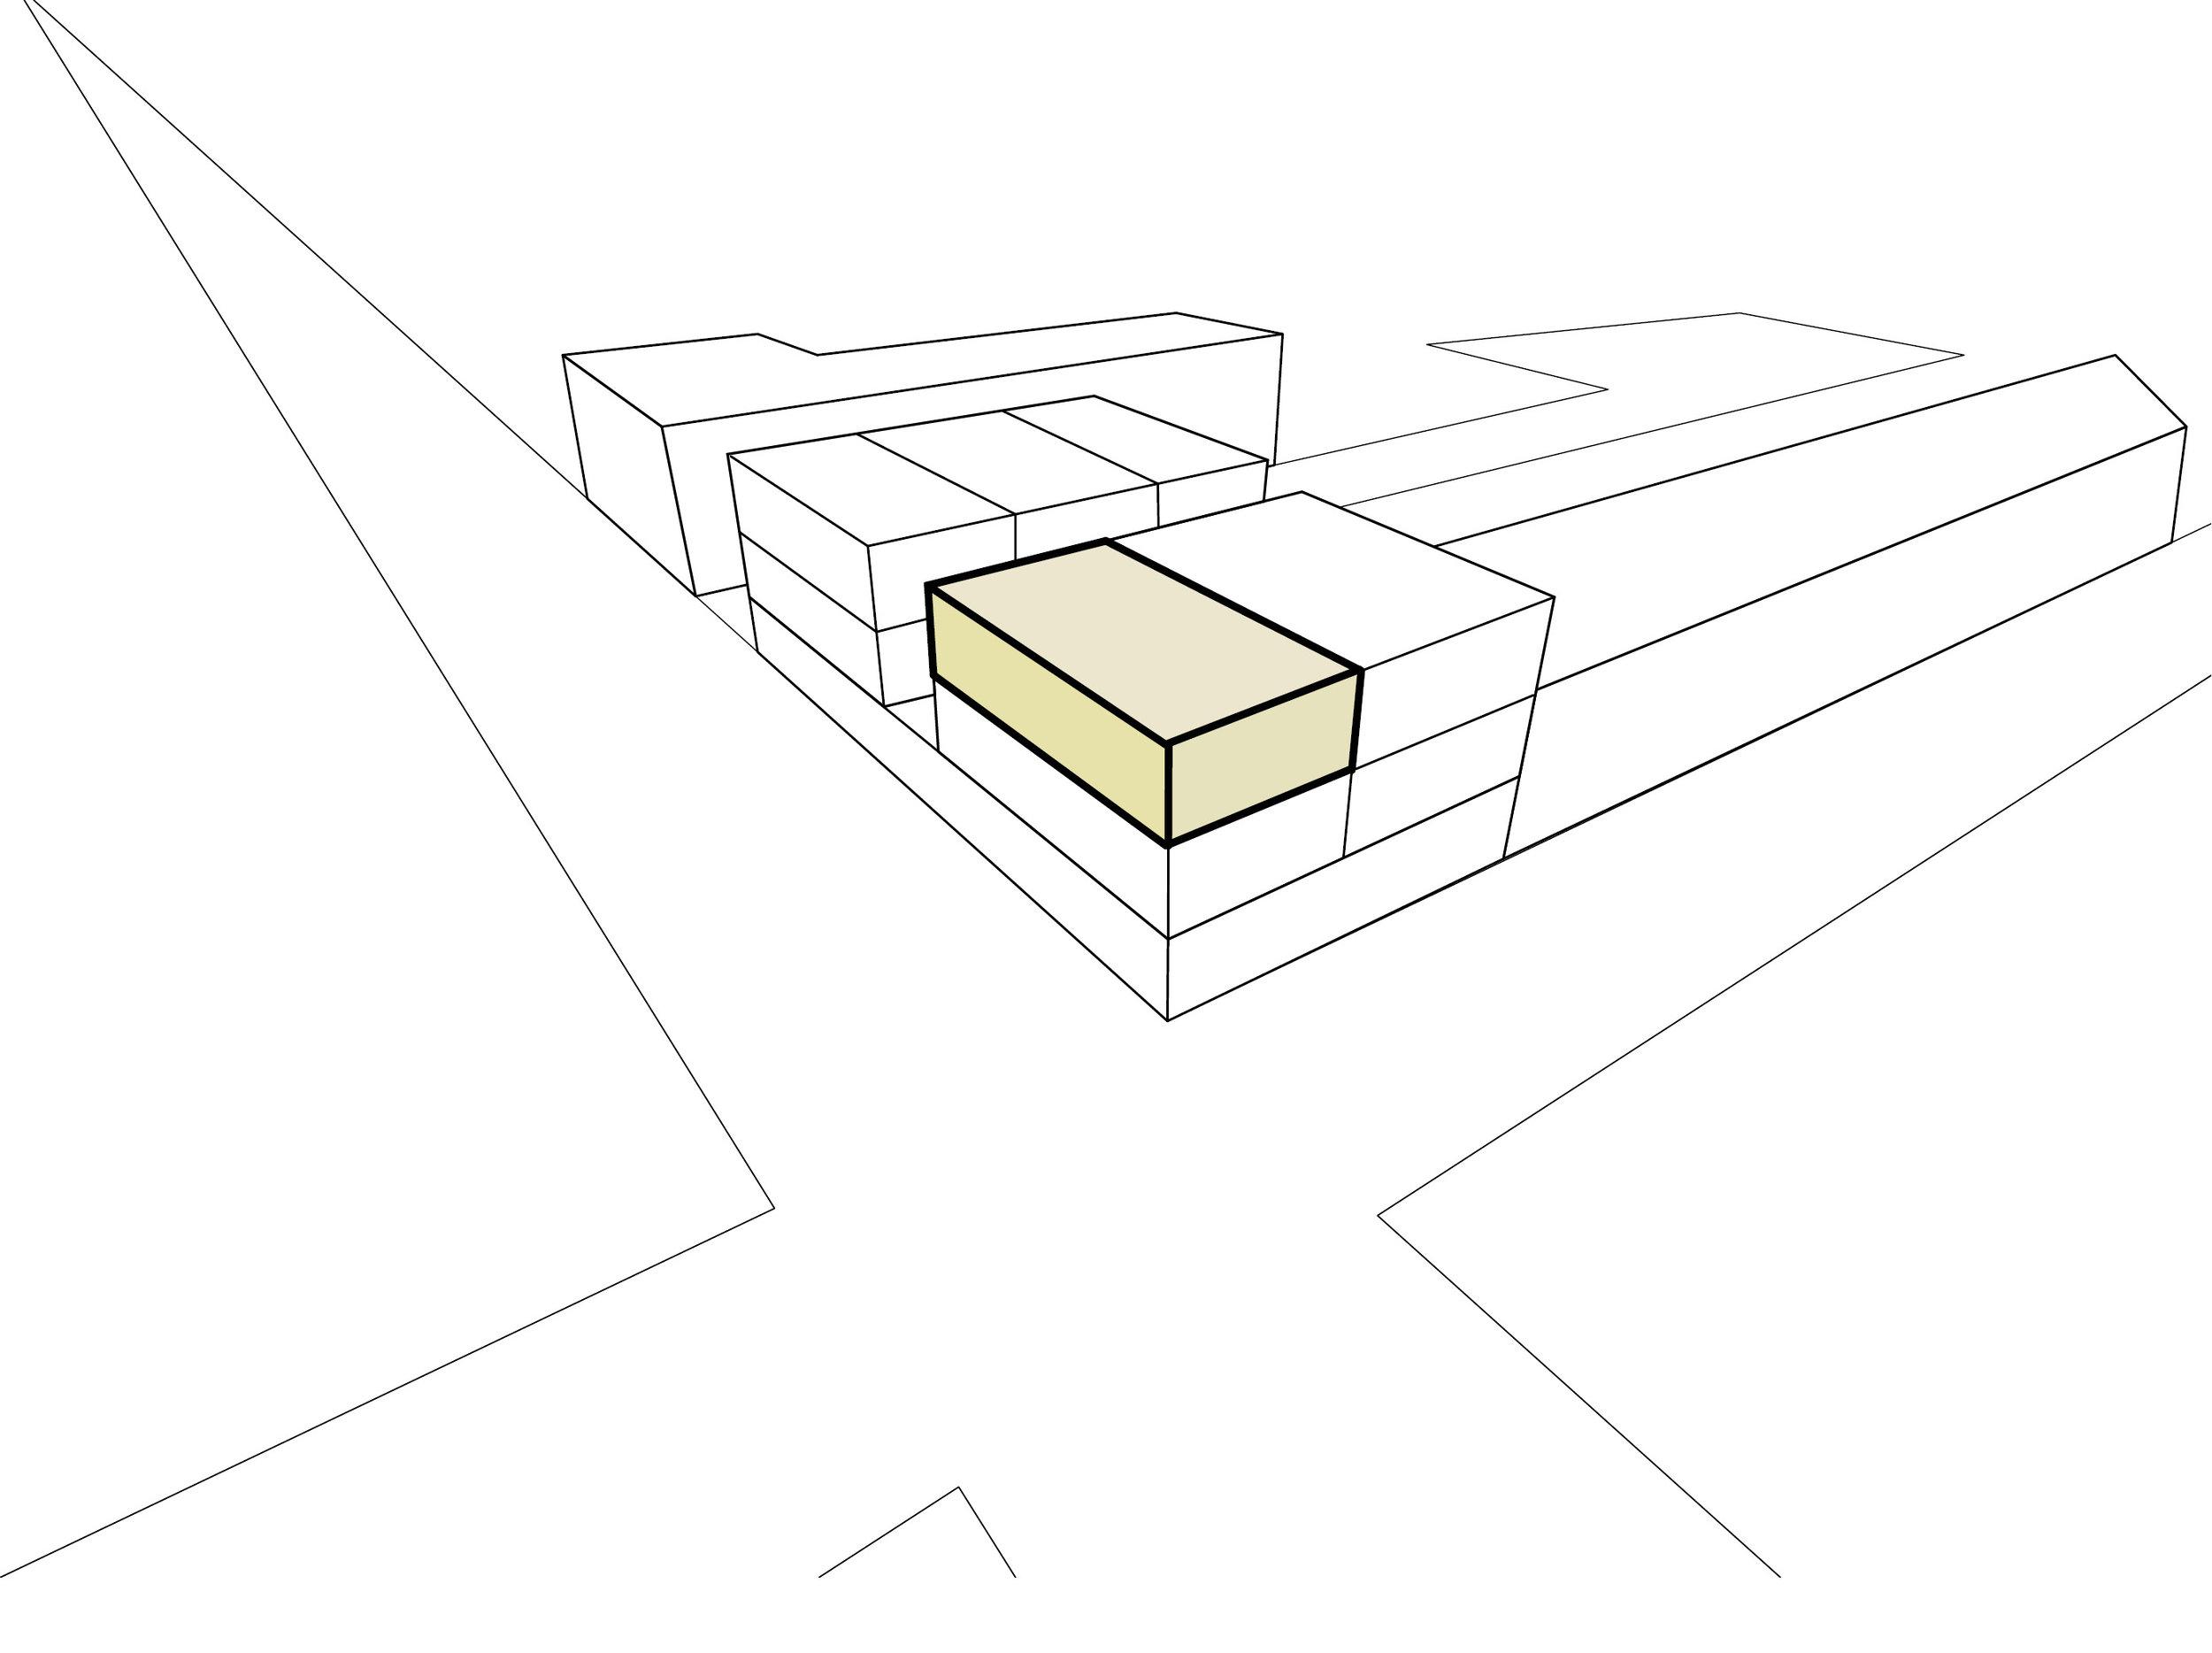 Personal-Architecture-nijmegen-appartementencomplex-5.jpg